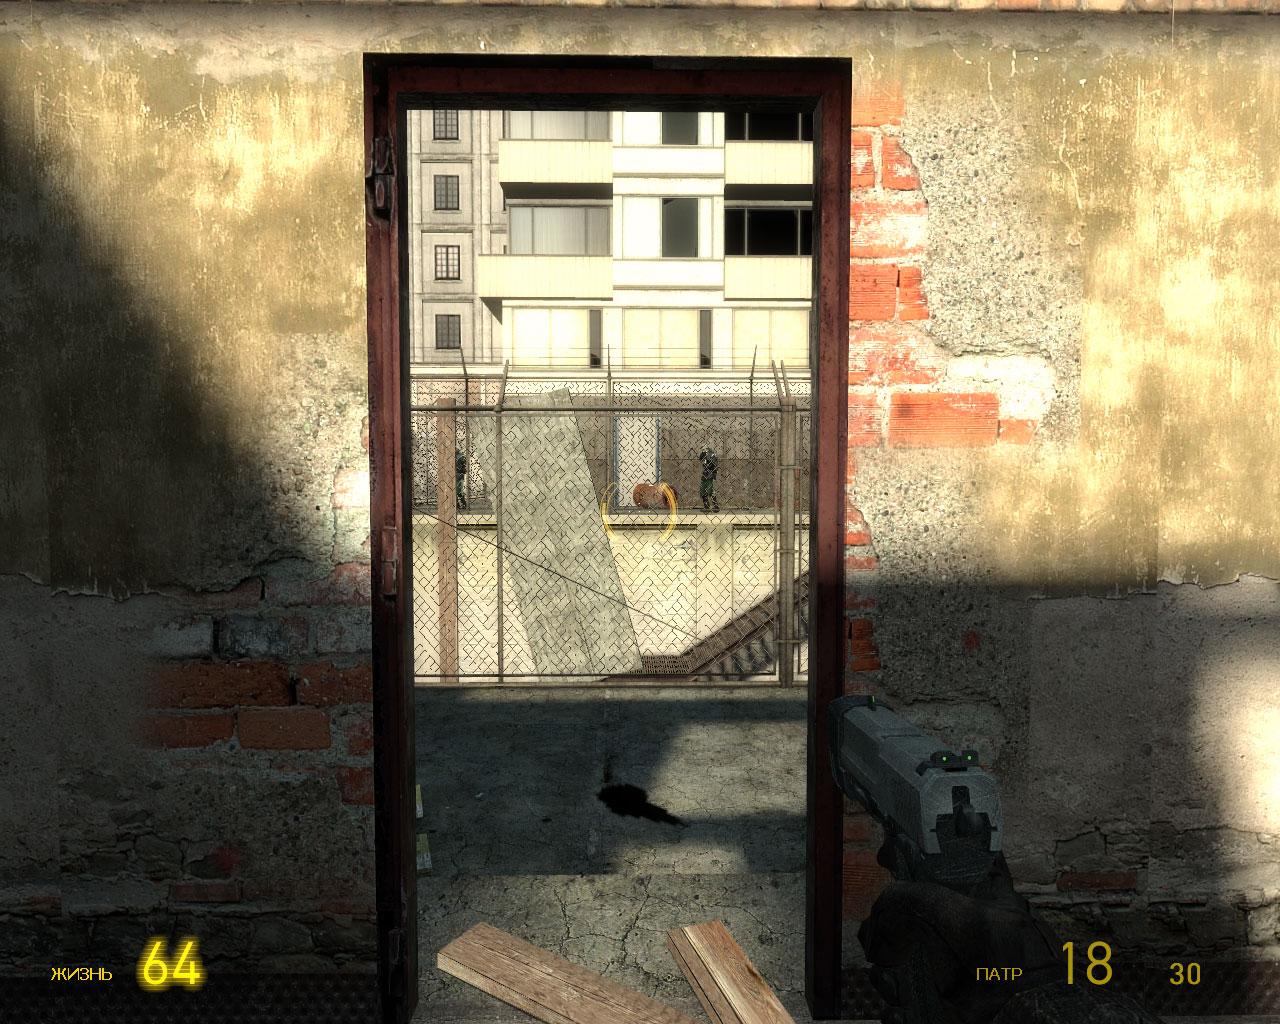 Half-life 2 (valve) (2004/rus) repack